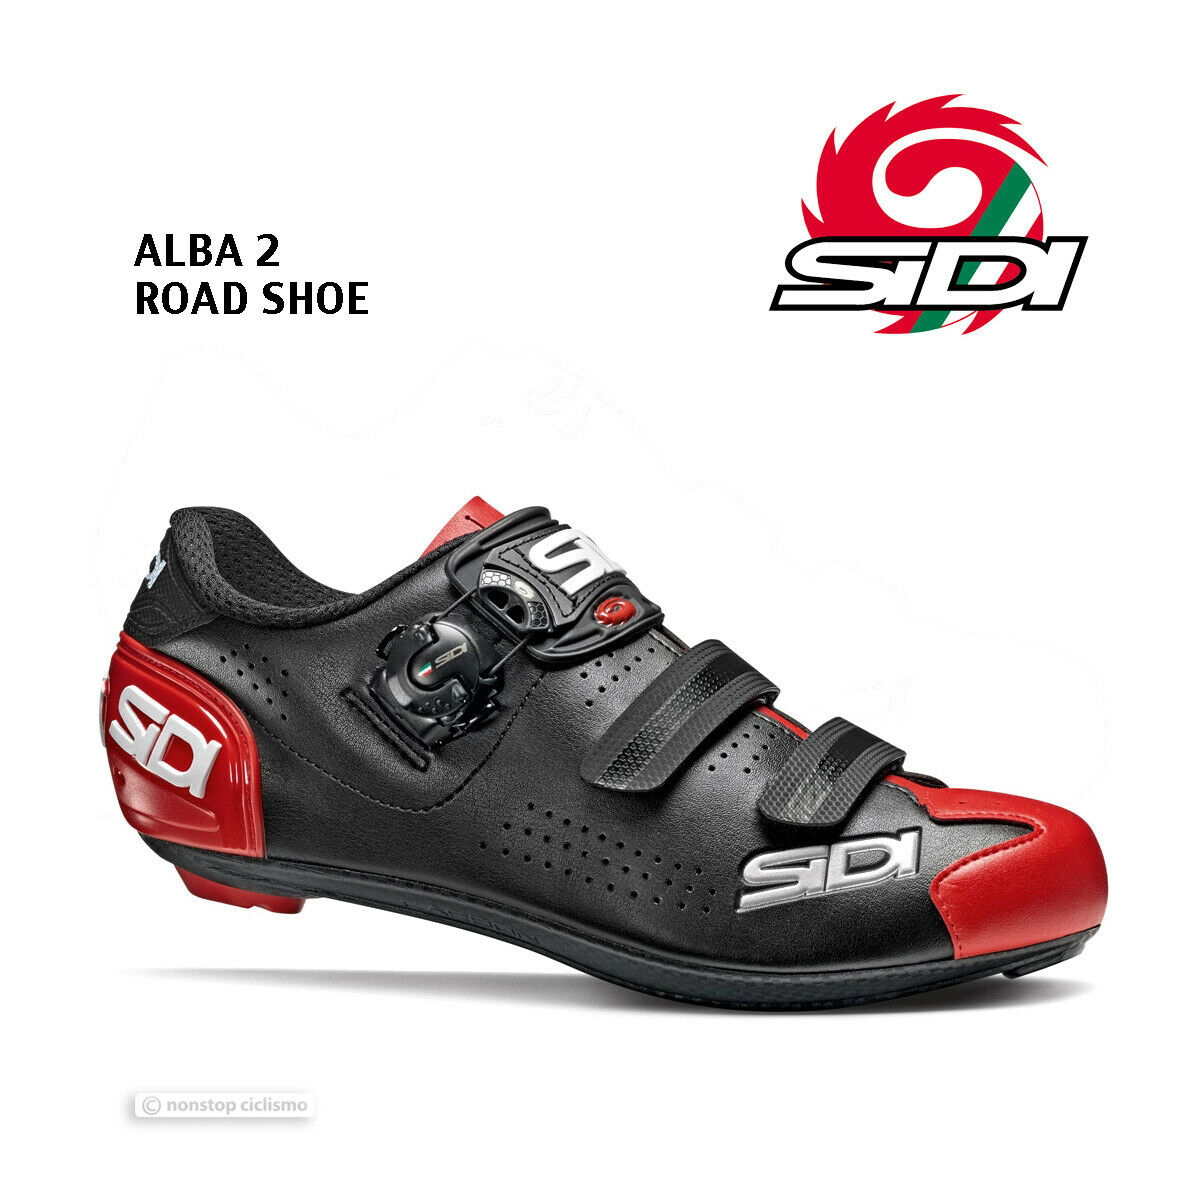 Neu 2020 Sidi Alba 2 Straße Fahrradschuhe: Schwarz/Rot